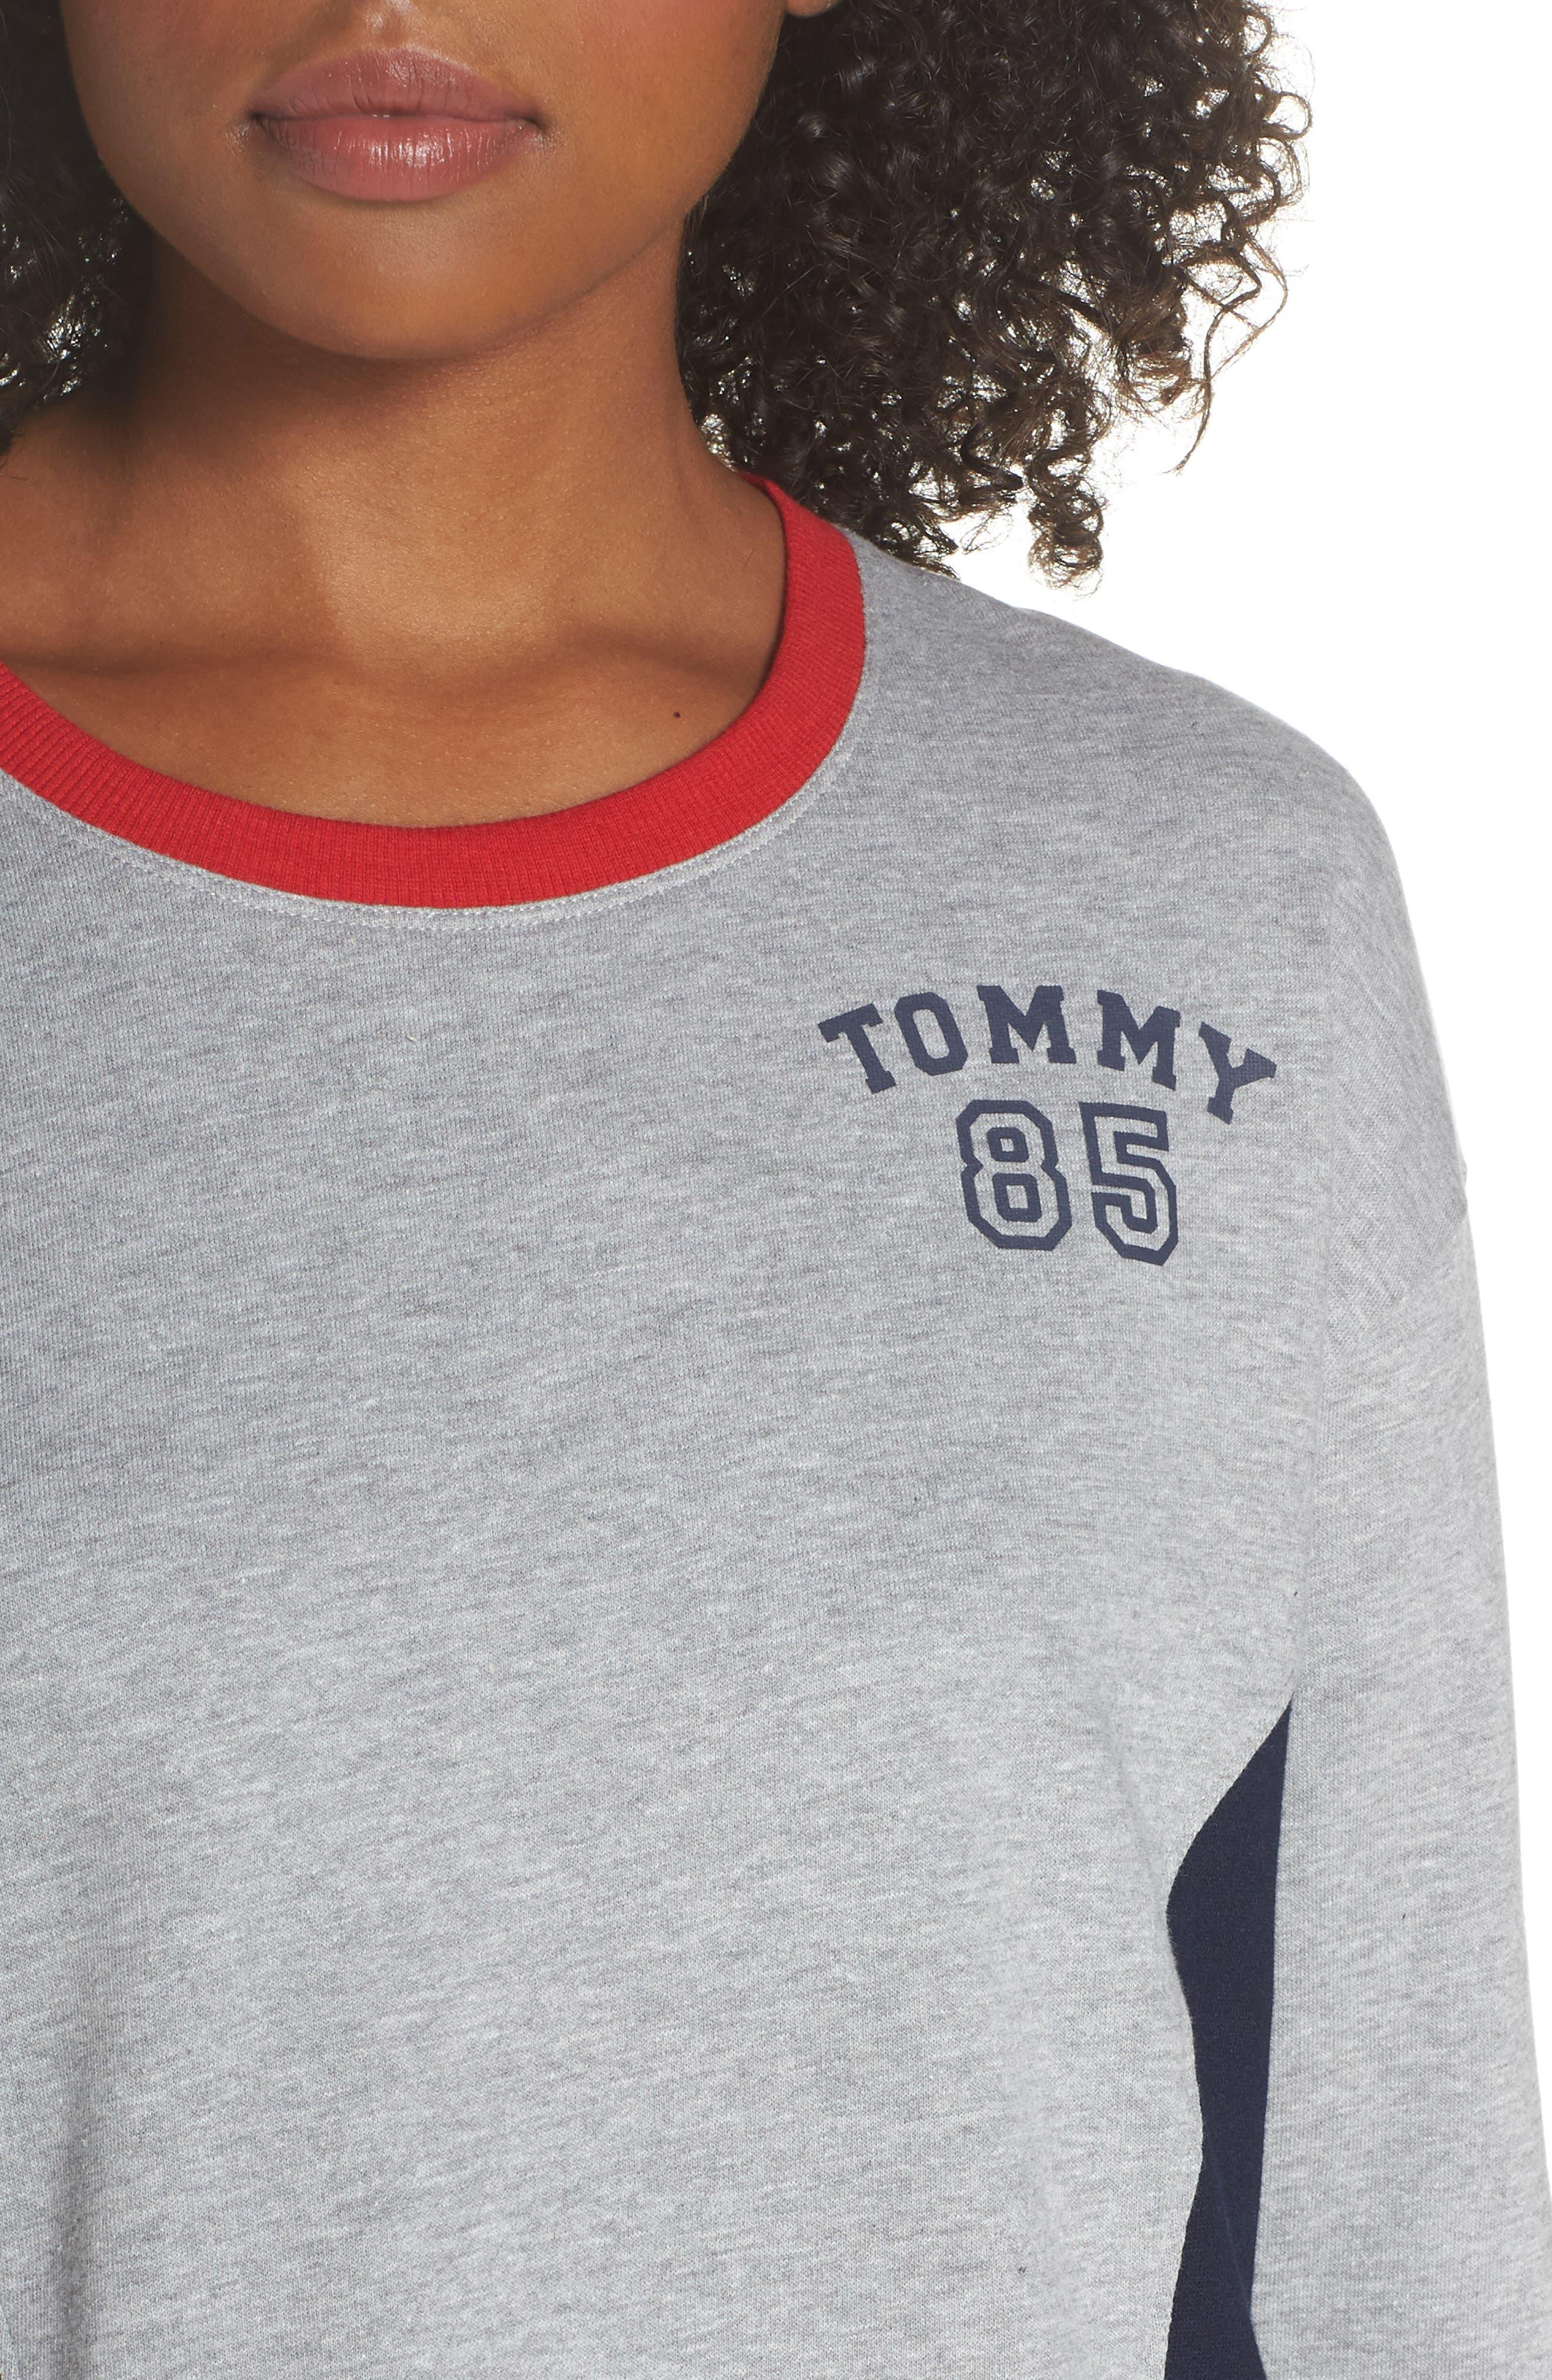 TOMMY HILFIGER,                             Crop Lounge Sweatshirt,                             Alternate thumbnail 4, color,                             025